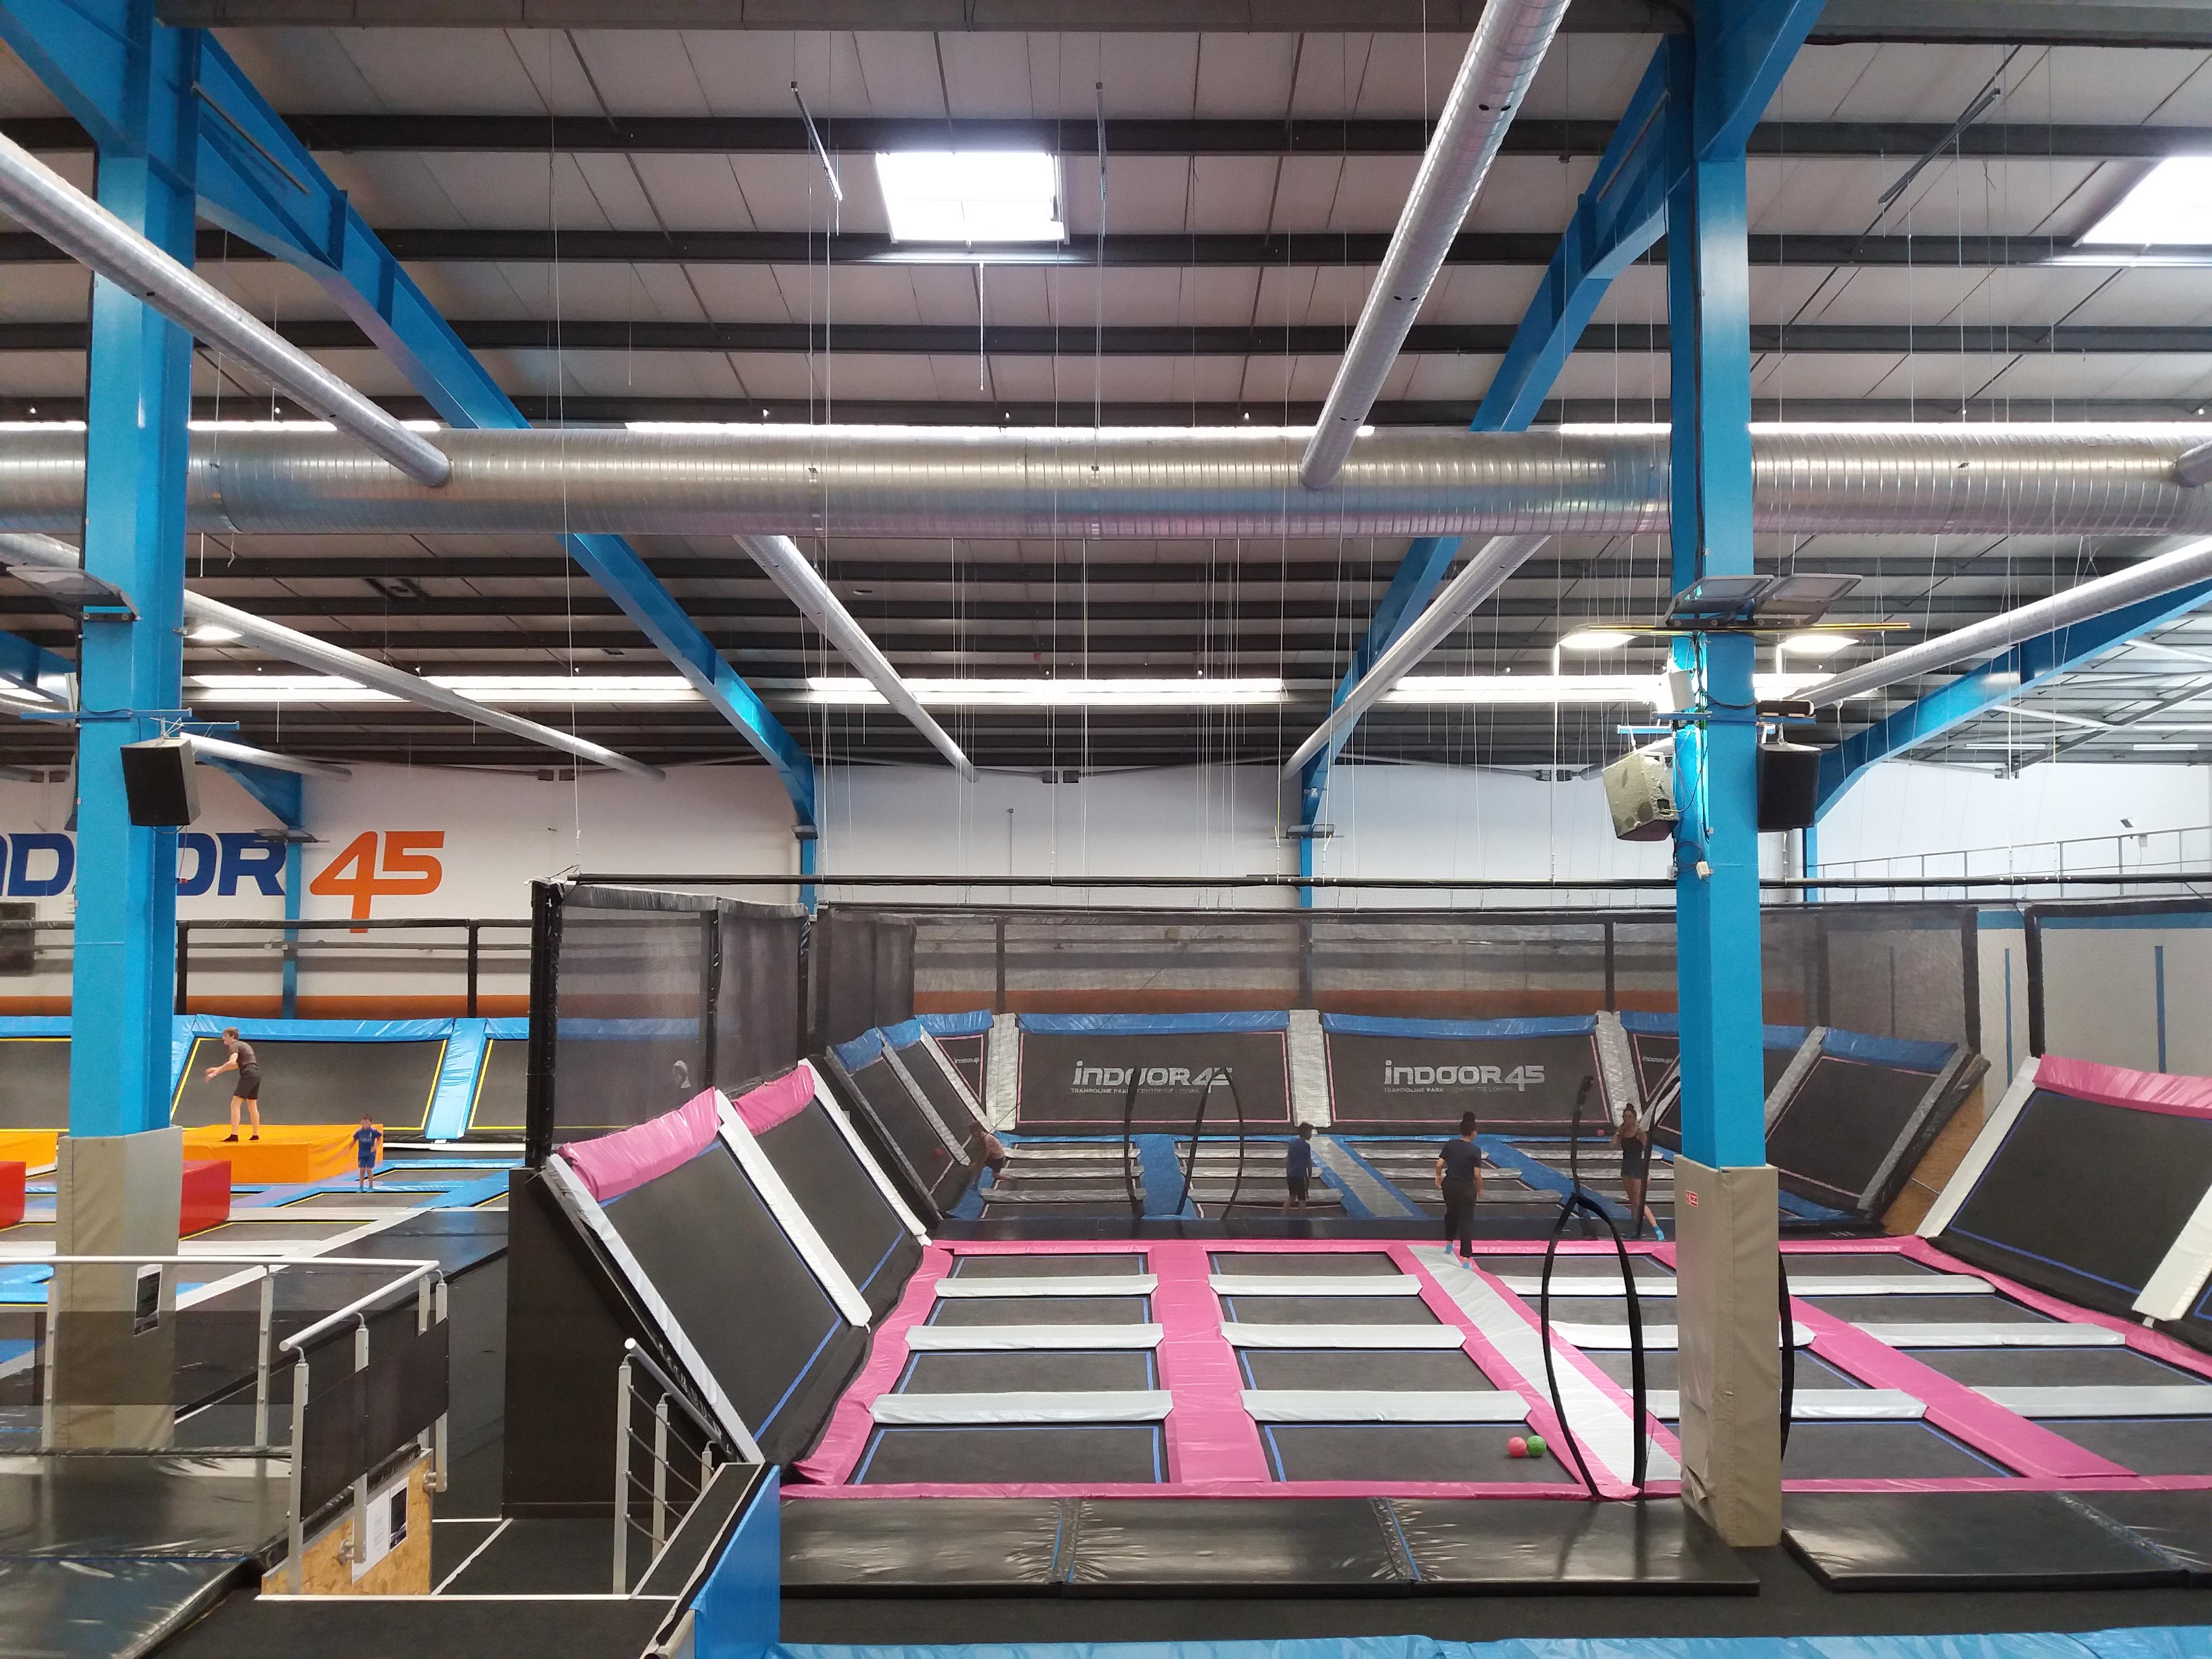 Rillieux-la-Pape - Indoor 45, trampolines (2).jpg Français : Trampolines. Date 14 July 2019, 16:58:55 Source Own work Author Romainbehar